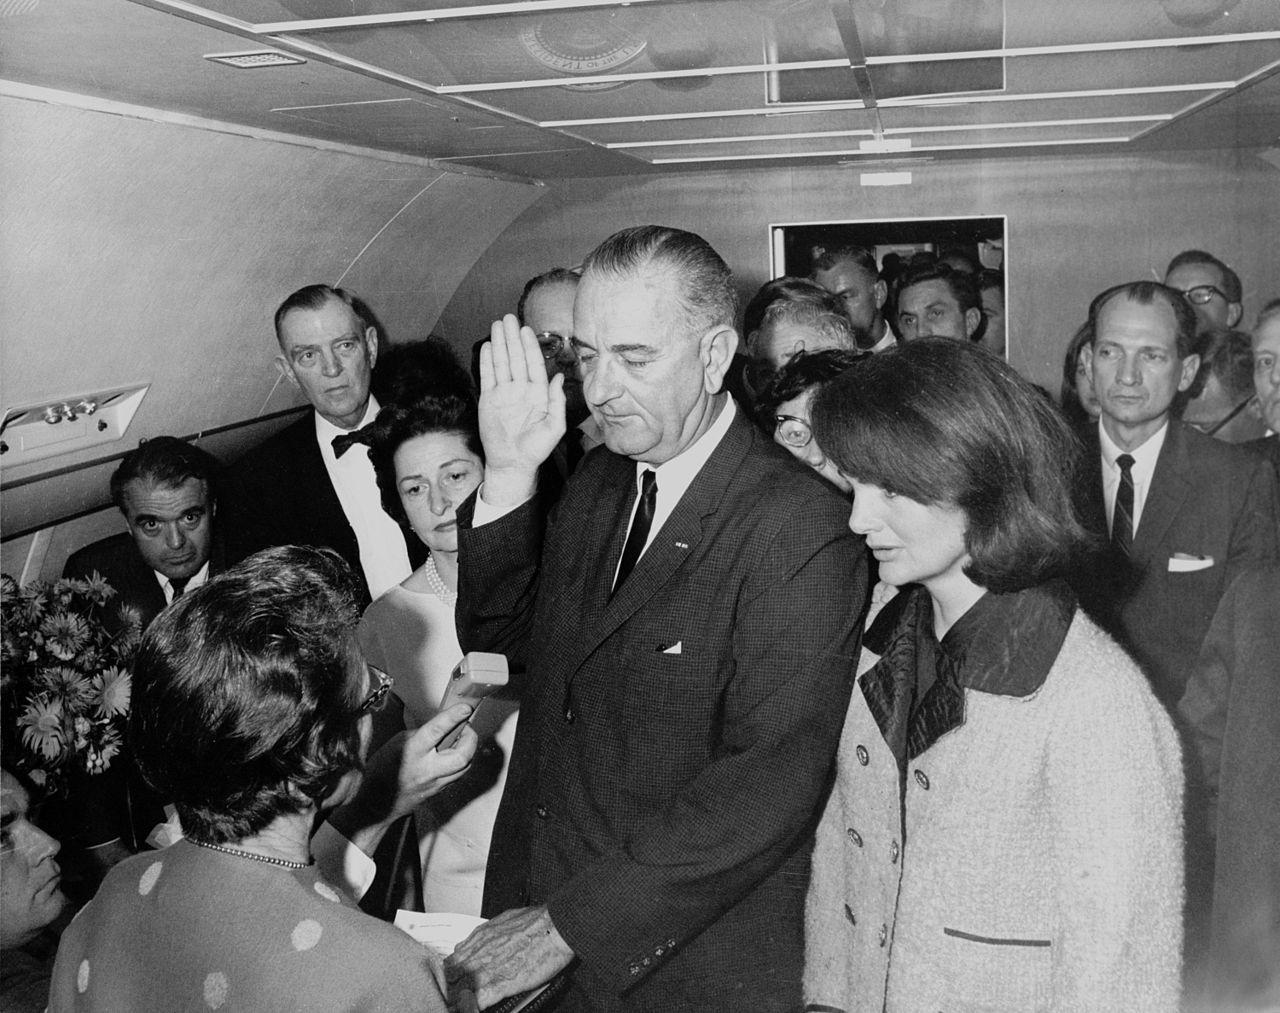 1280px-Lyndon_B._Johnson_taking_the_oath_of_office,_November_1963.jpg